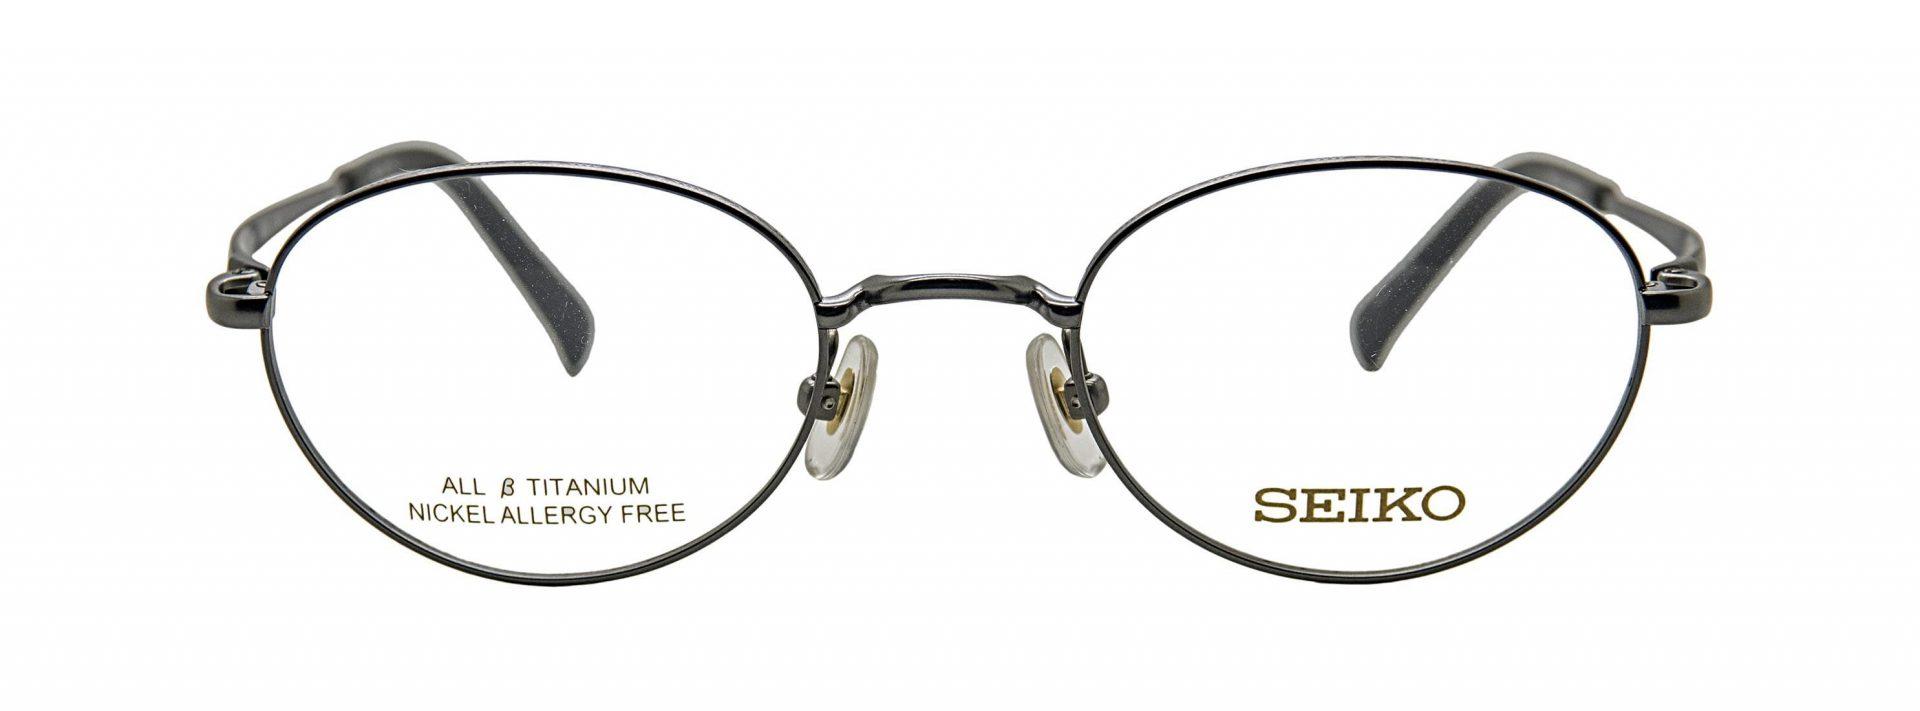 Seiko spectacles T947 01 2970x1100